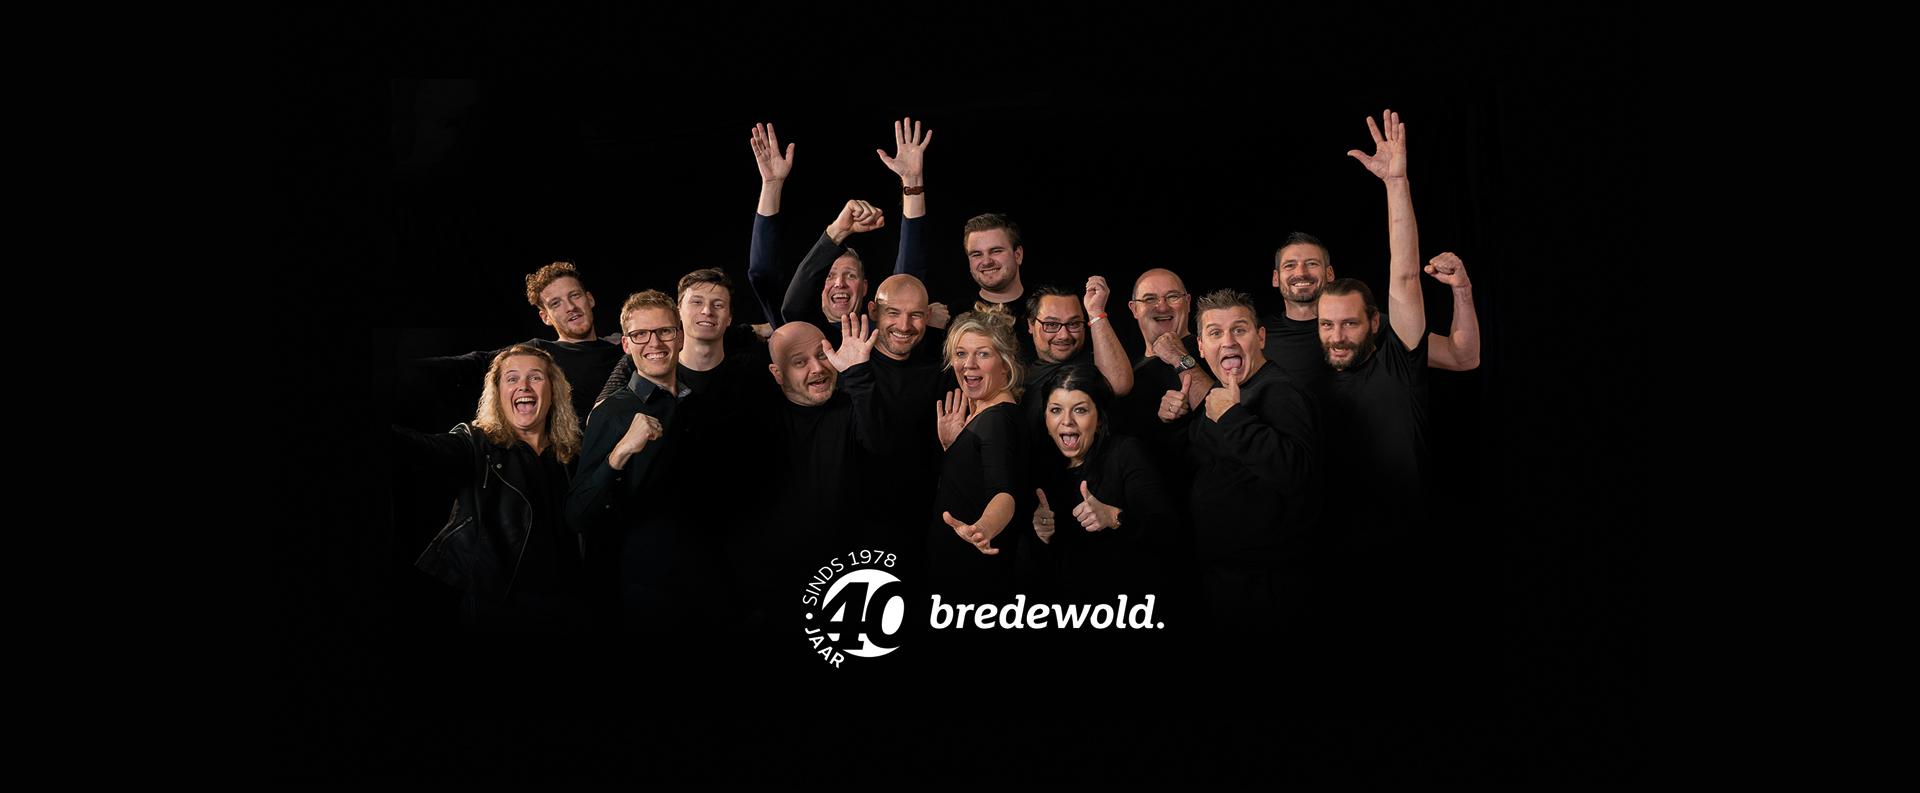 Bredewold-feest-40-jaar-web-2